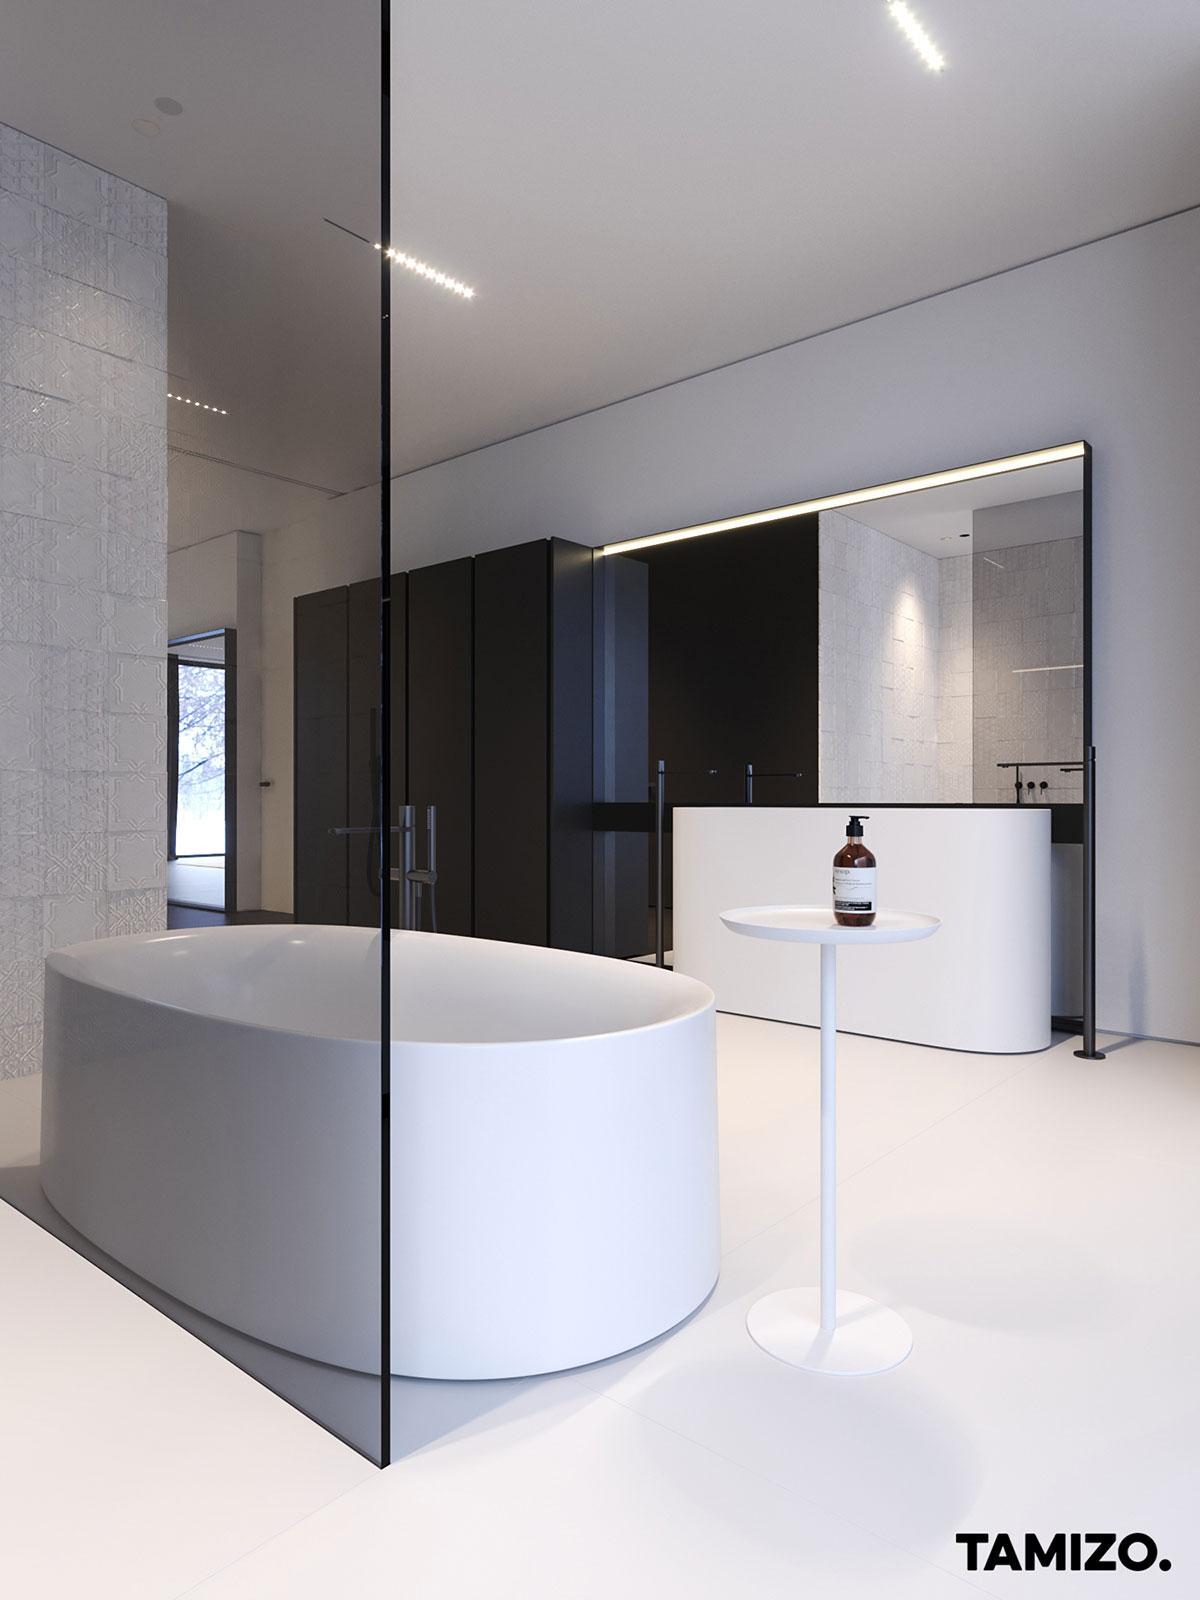 tamizo_architects_mateusz_kuo_stolarski_tomaszow_mazowiecki_interior_design_house_minimal_16